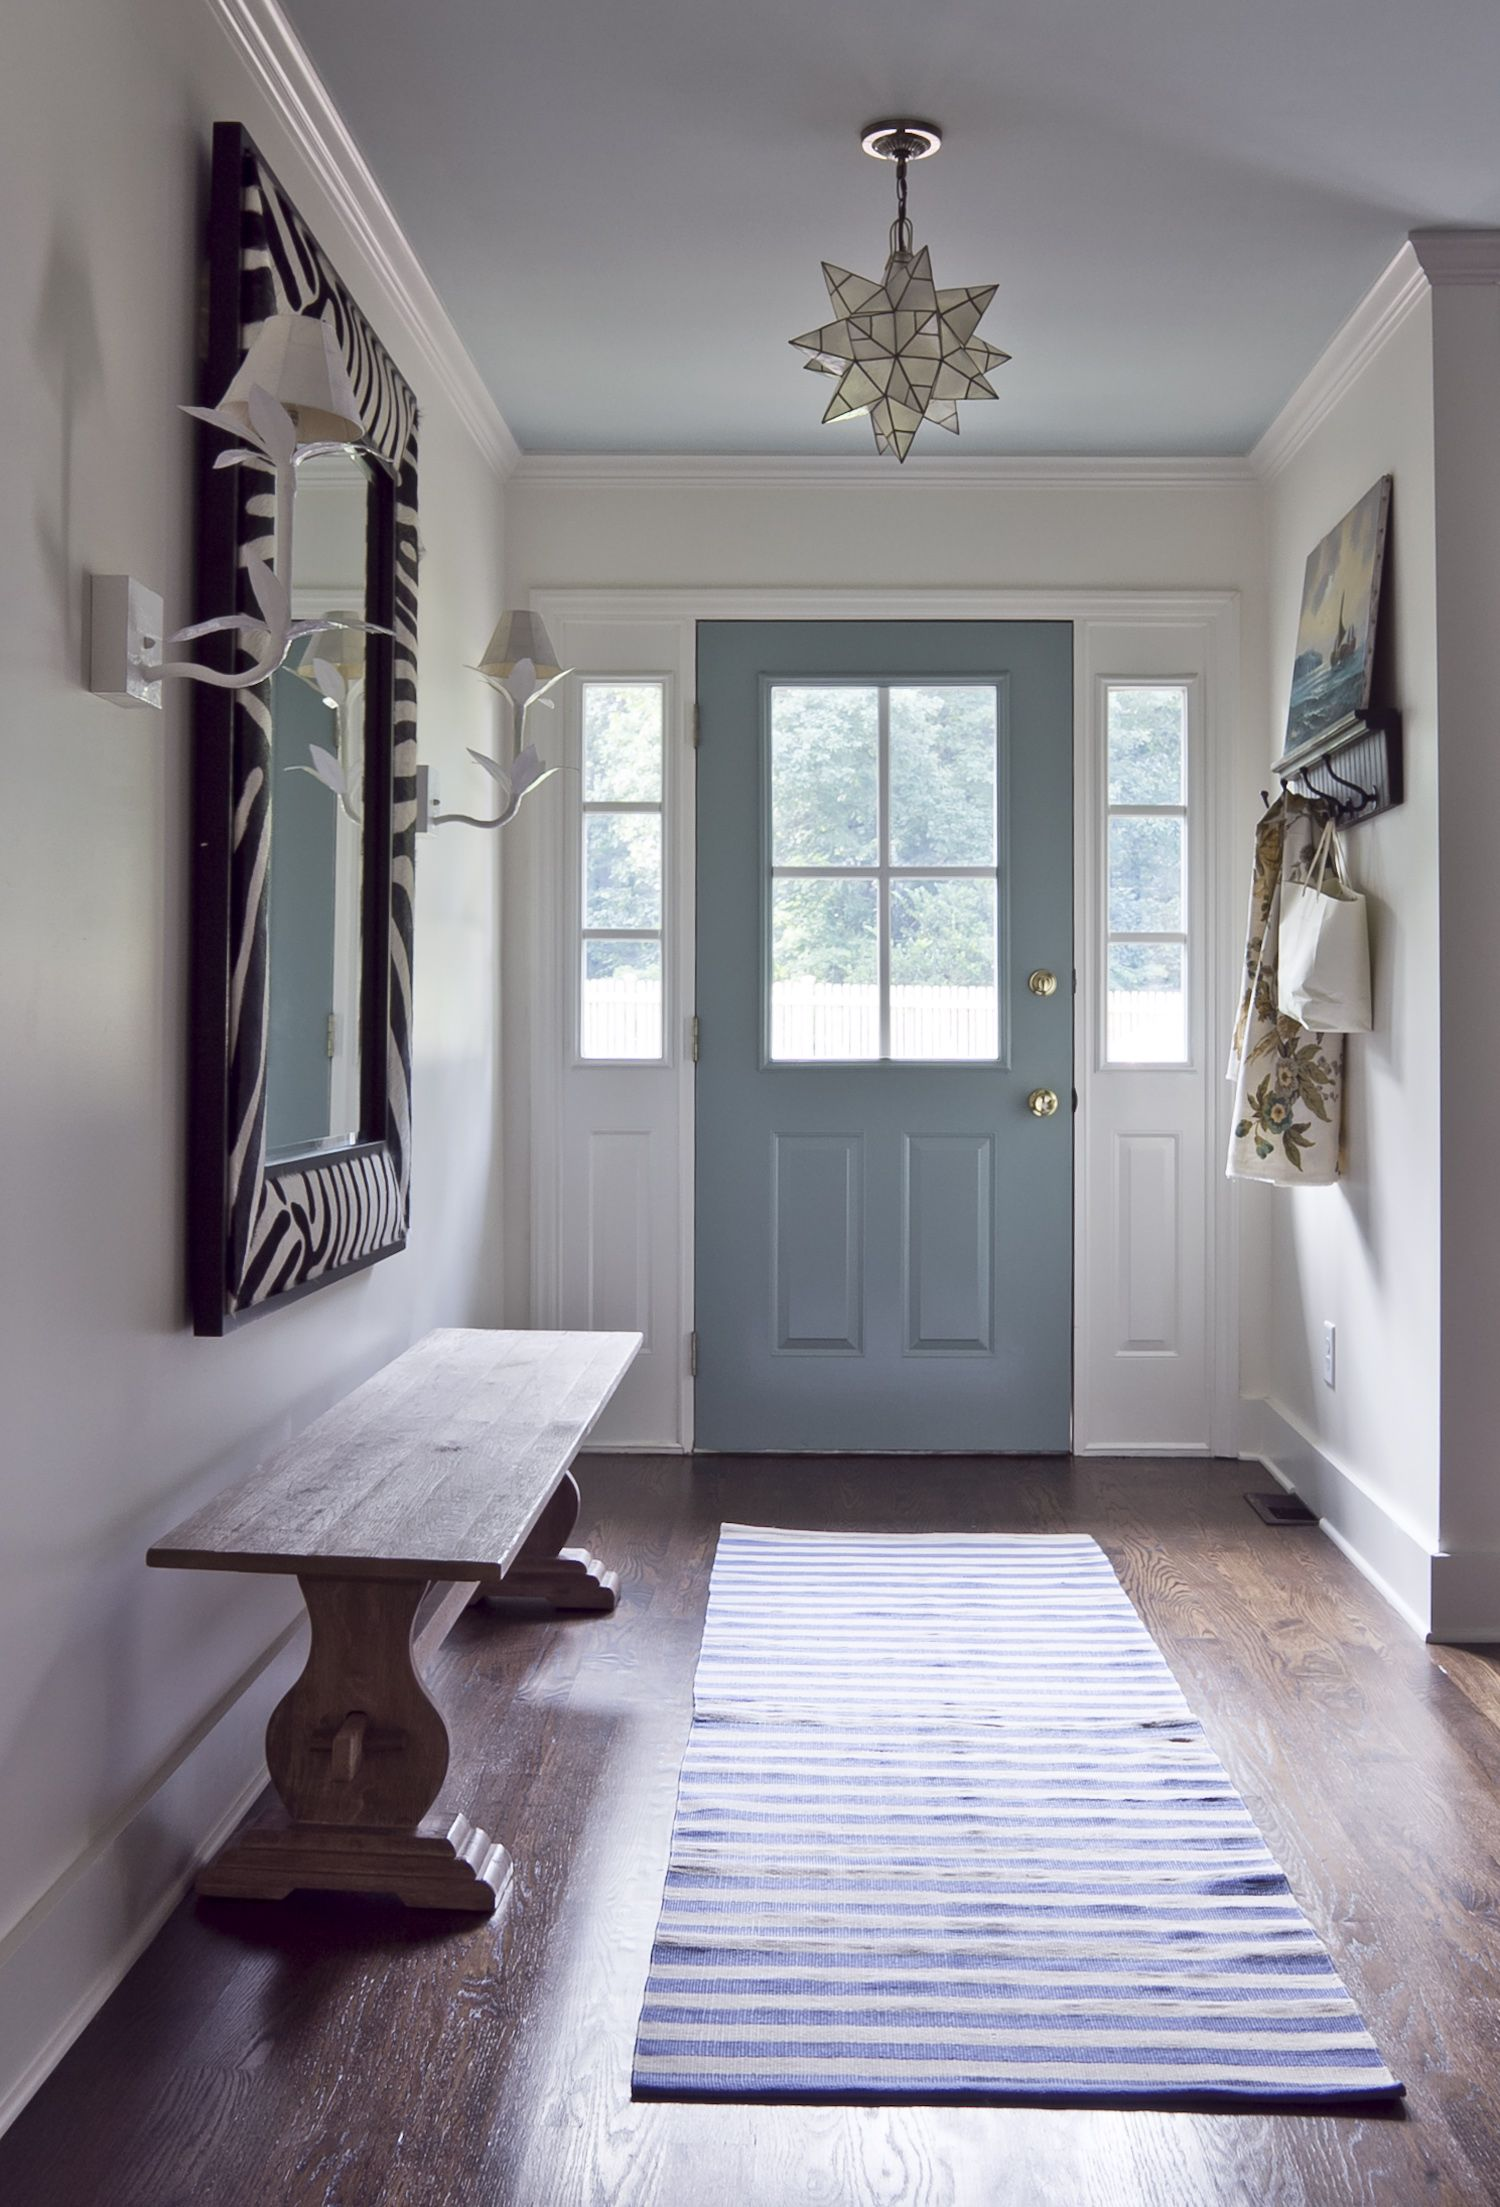 Bm Stratton Blue Door Bm Palladian Blue Ceiling Home Painted Front Doors Luxury Interior Design